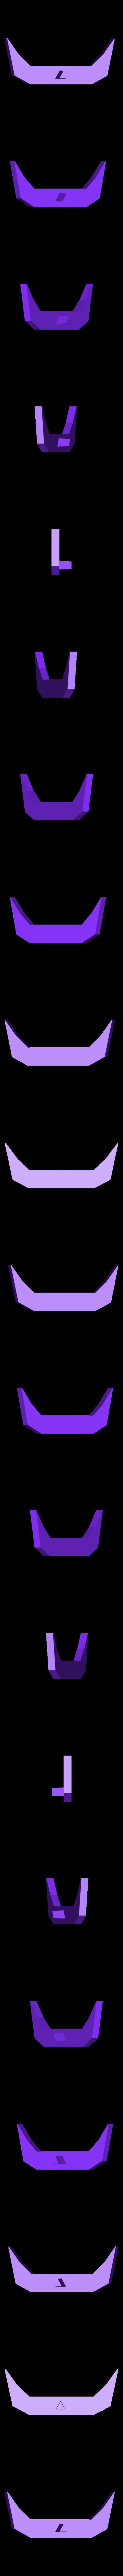 B_001_Wing.STL Download free STL file Corvette • Model to 3D print, BEEVERYCREATIVE